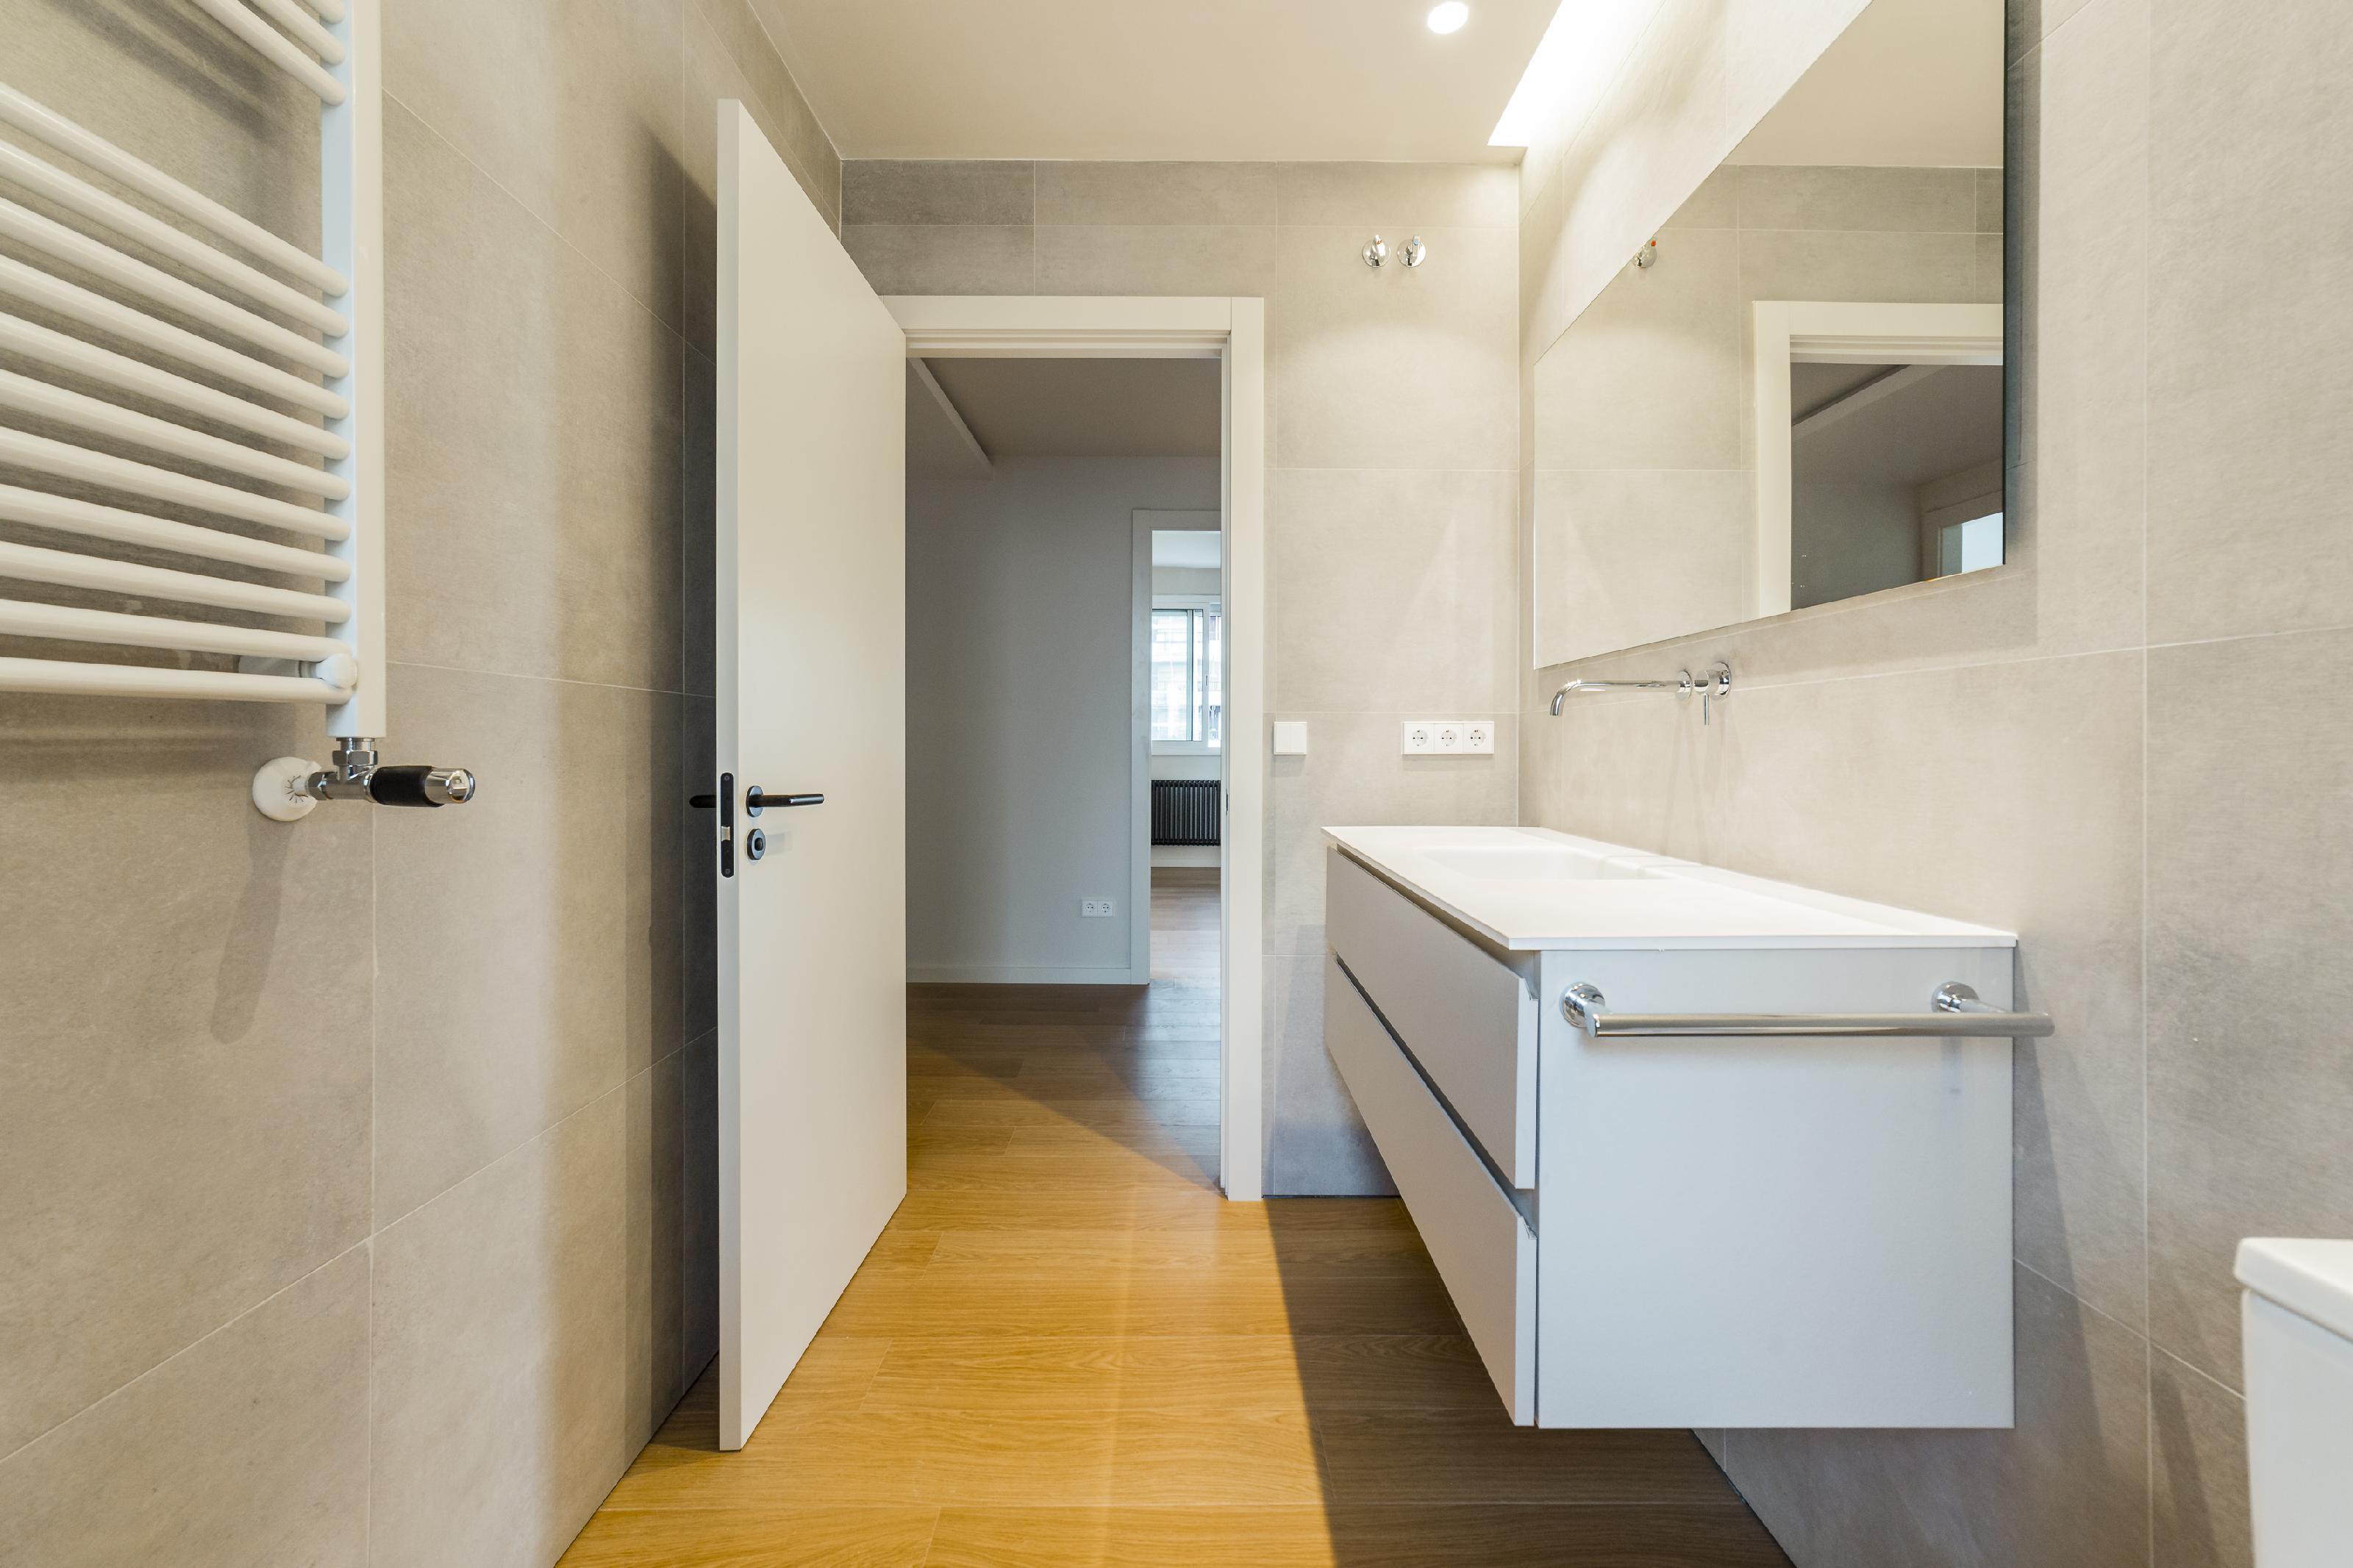 253492 Flat for sale in Sarrià-Sant Gervasi, Sant Gervasi-Galvany 27